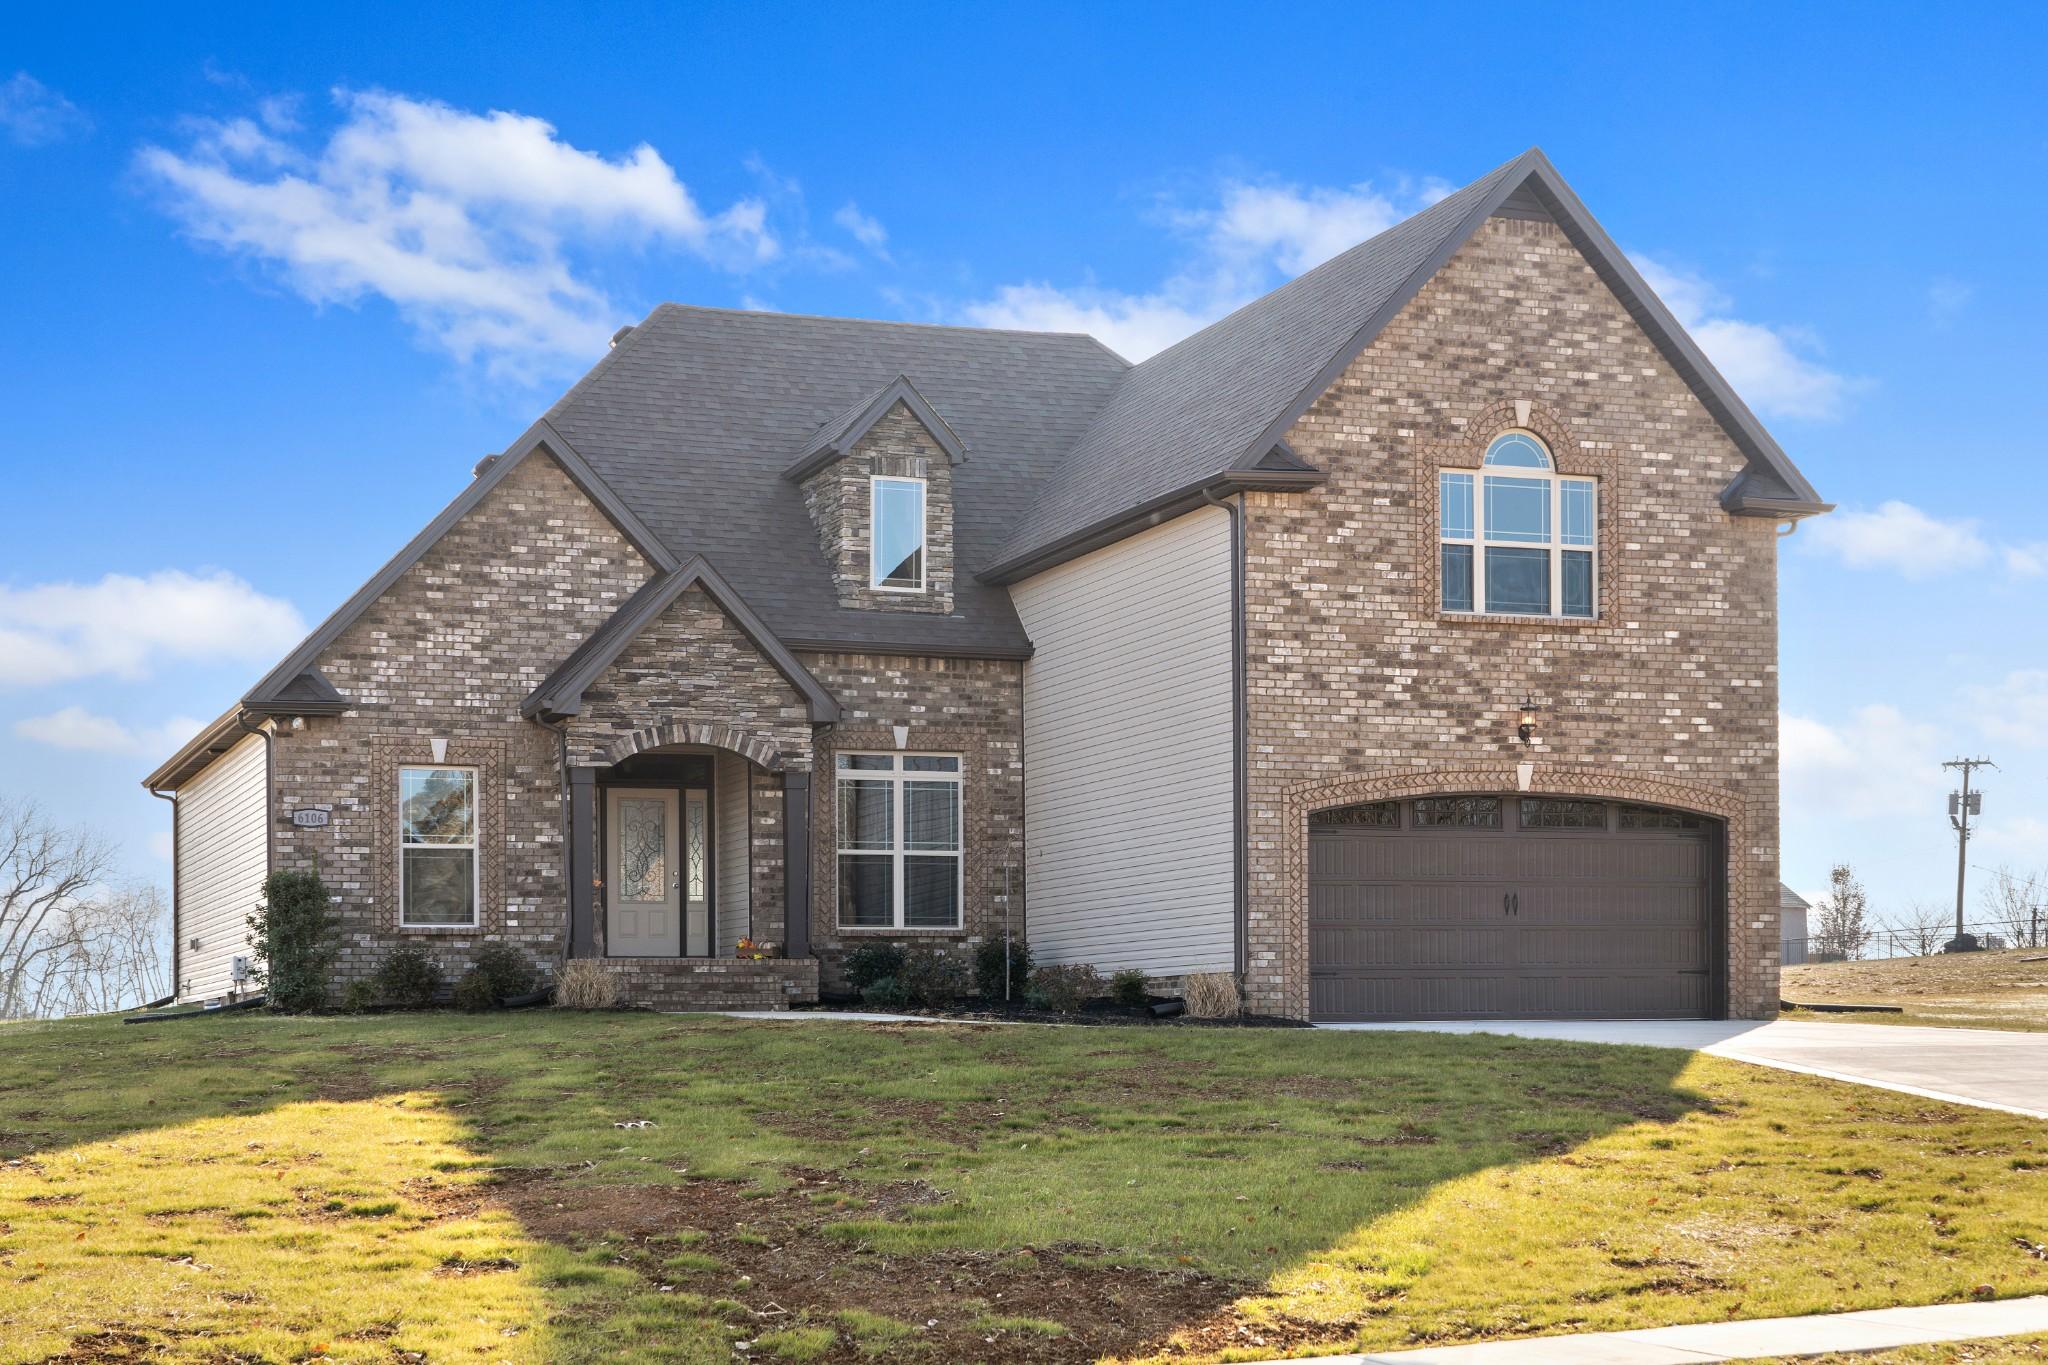 30 Morningwood, Clarksville, TN 37042 - Clarksville, TN real estate listing